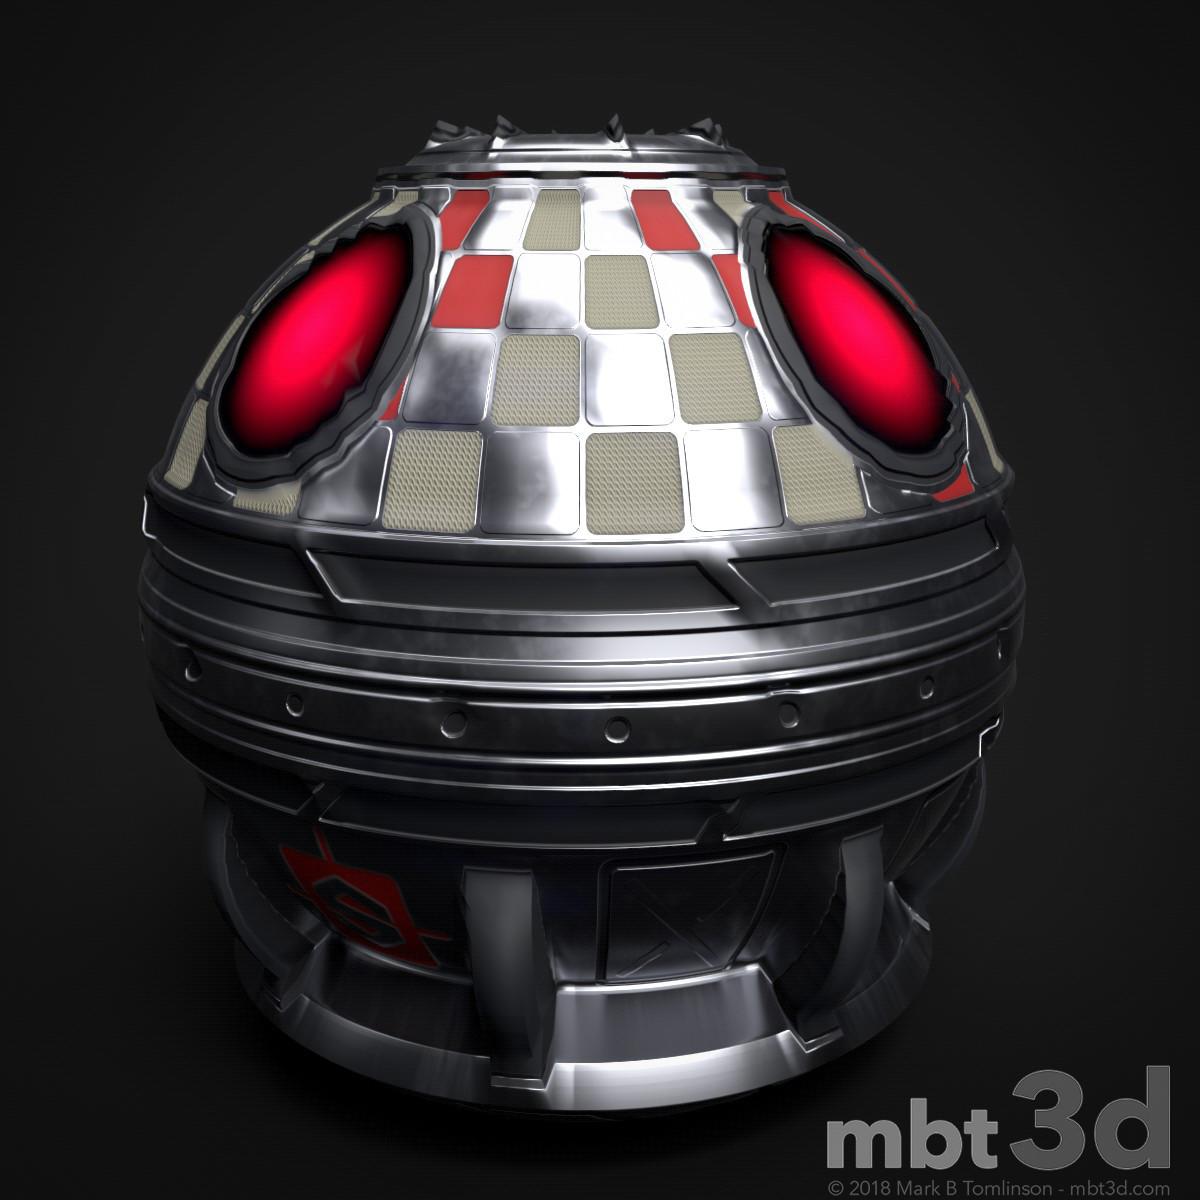 Sci-Fi Capsule - Sphere